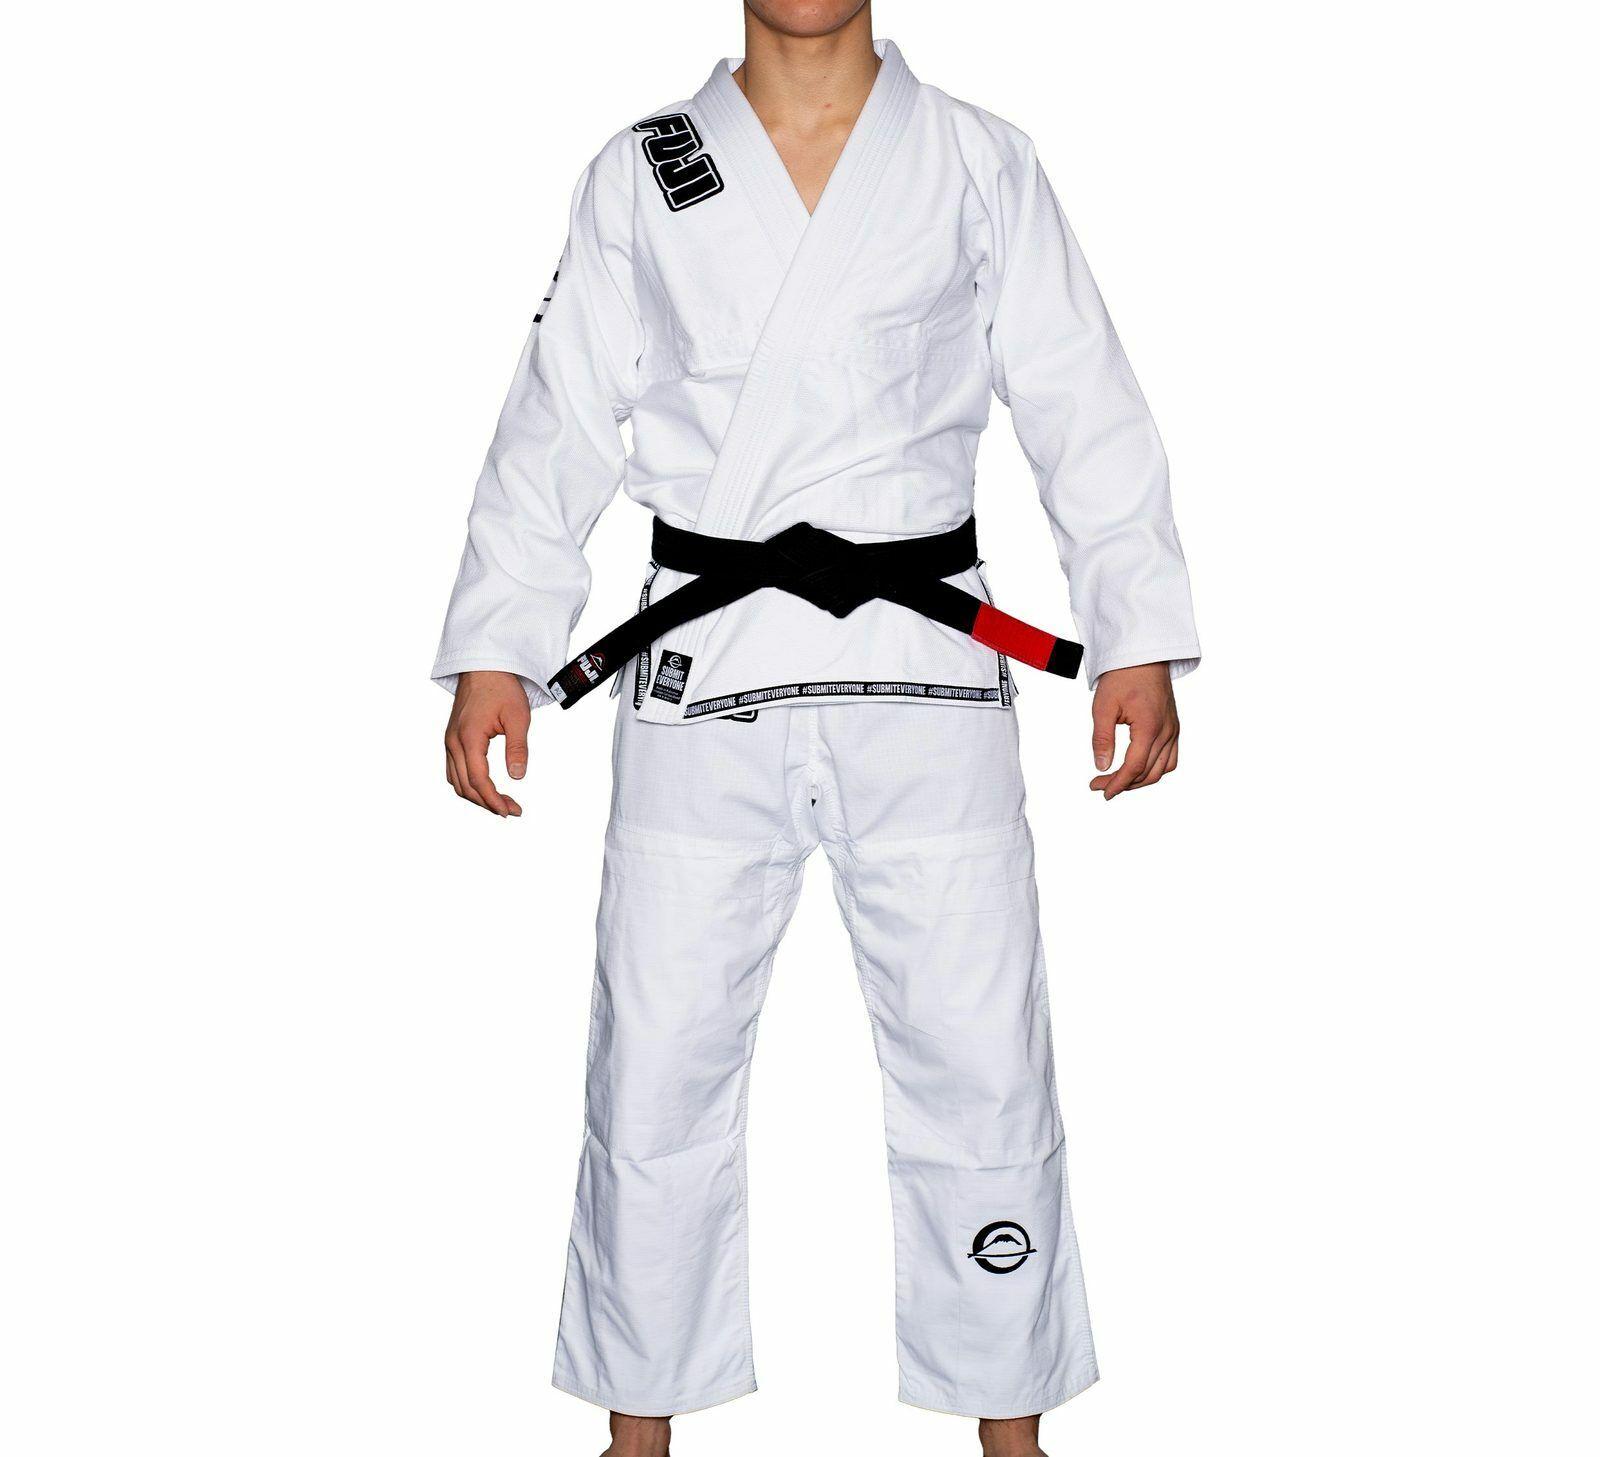 Fuji Submit Everyone Mens Brazilian Jiu-Jitsu BJJ Gi - White